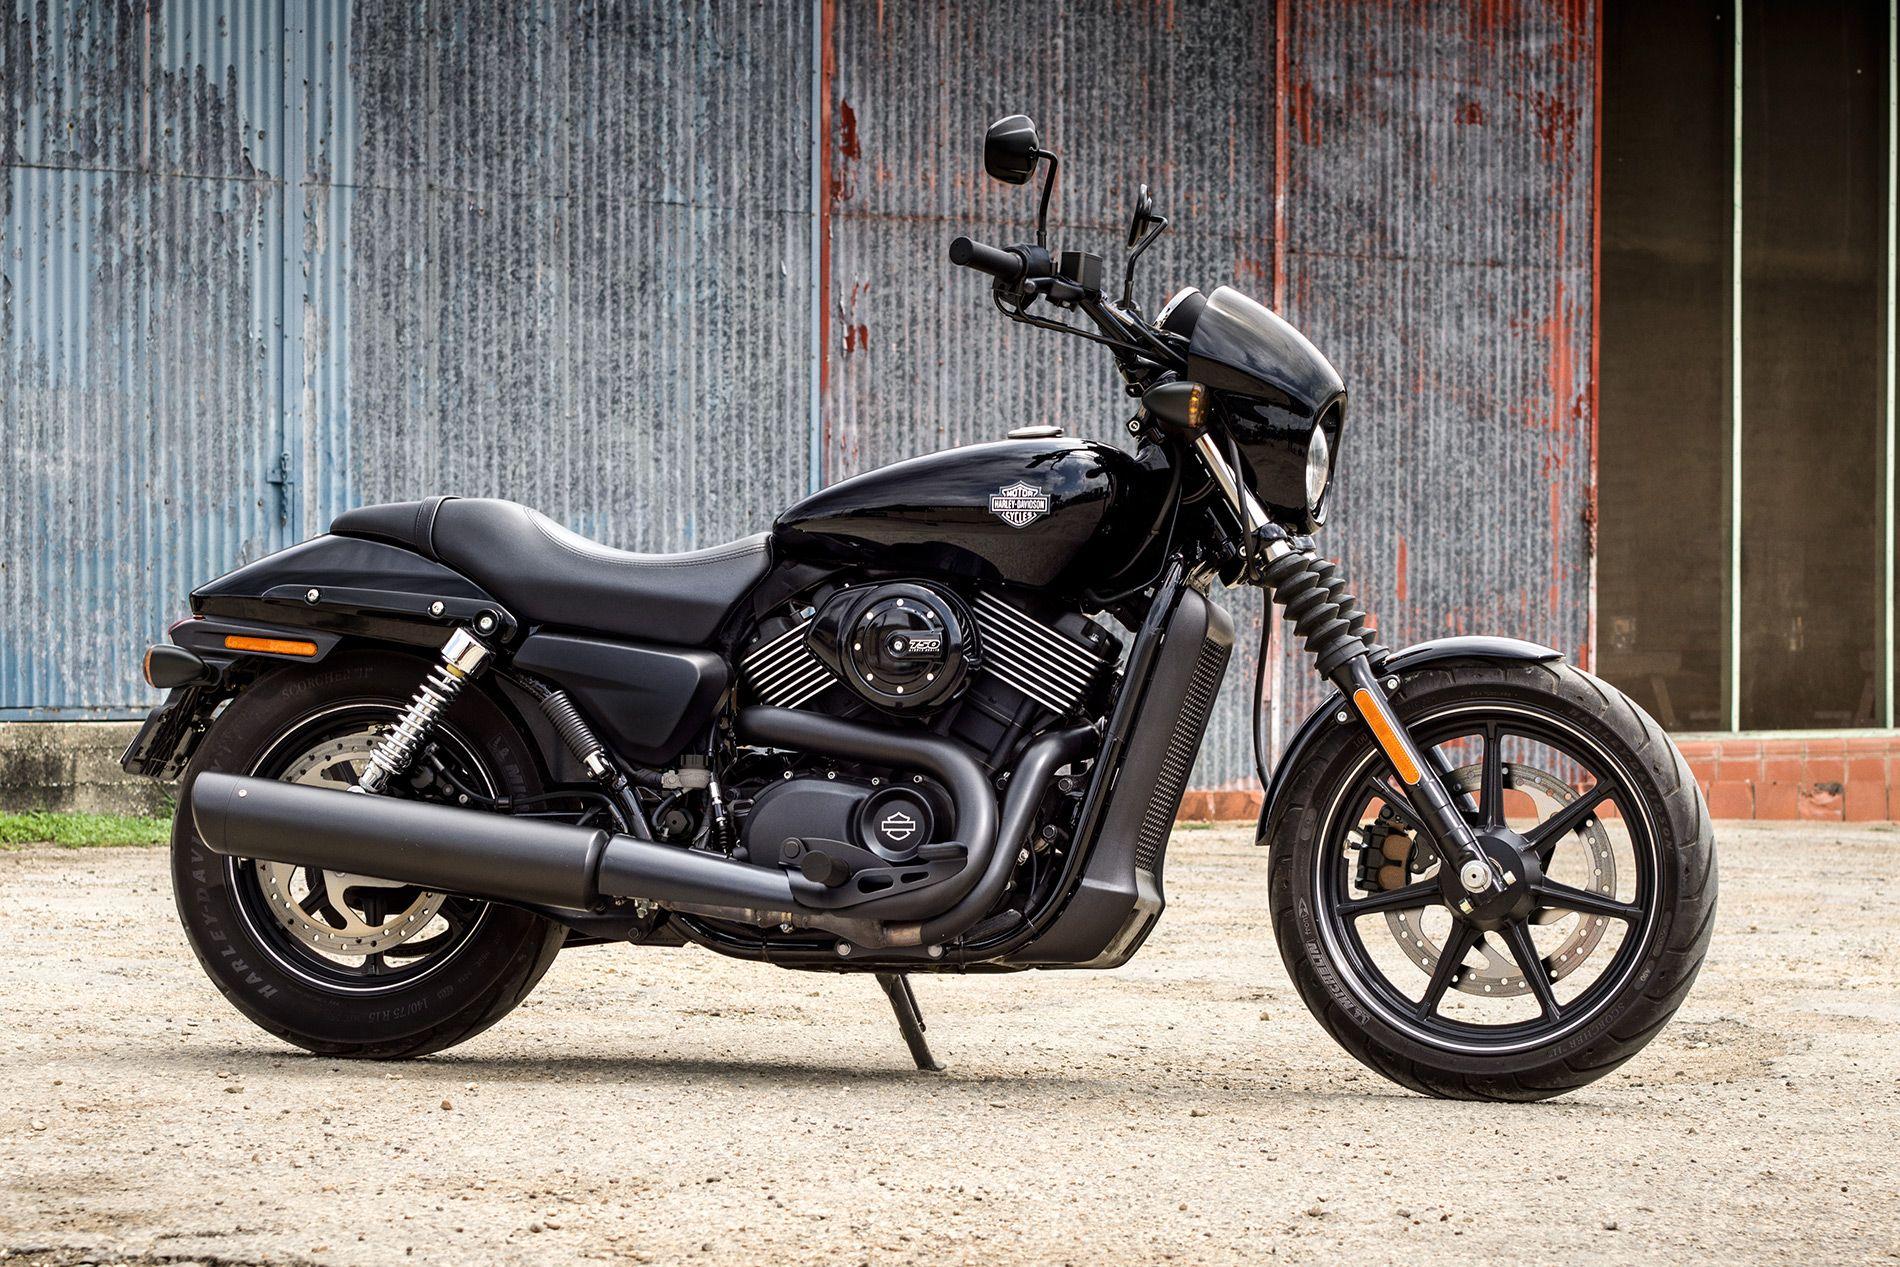 Harley Davidson Street Rod XG 750 A URGENT SALES